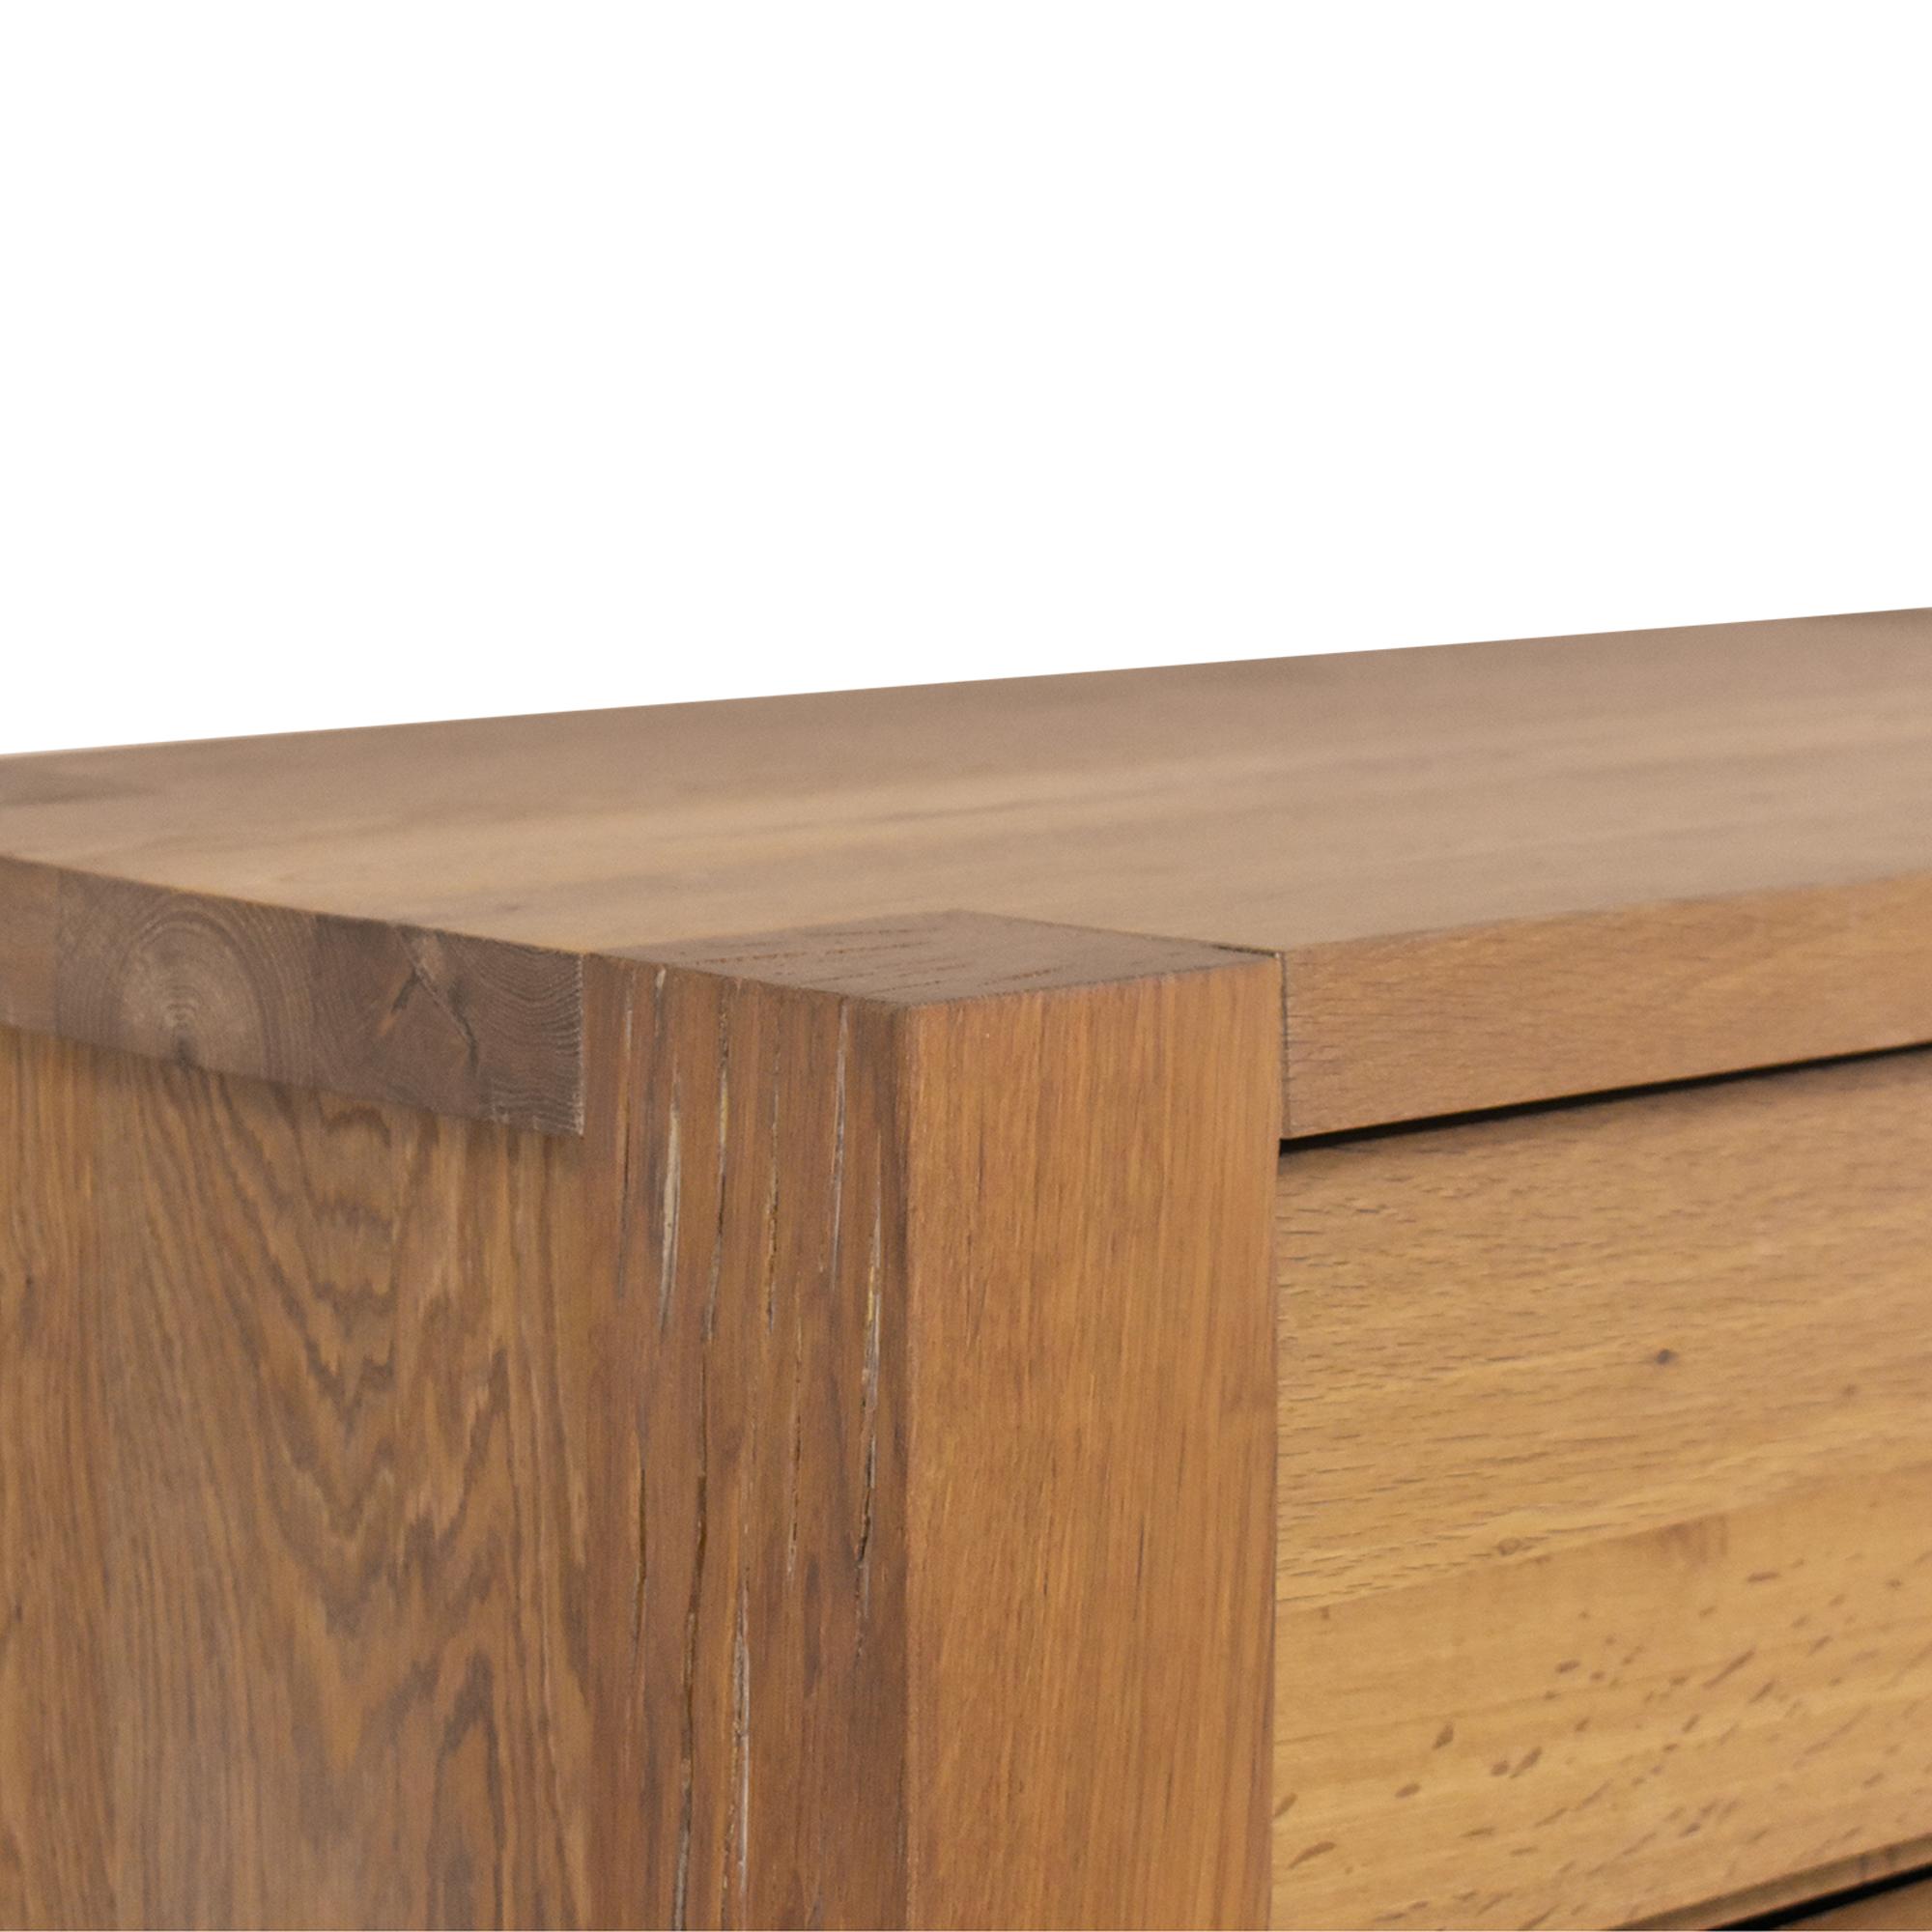 shop Crate & Barrel Crate & Barrel Big Sur Five Drawer Chest online